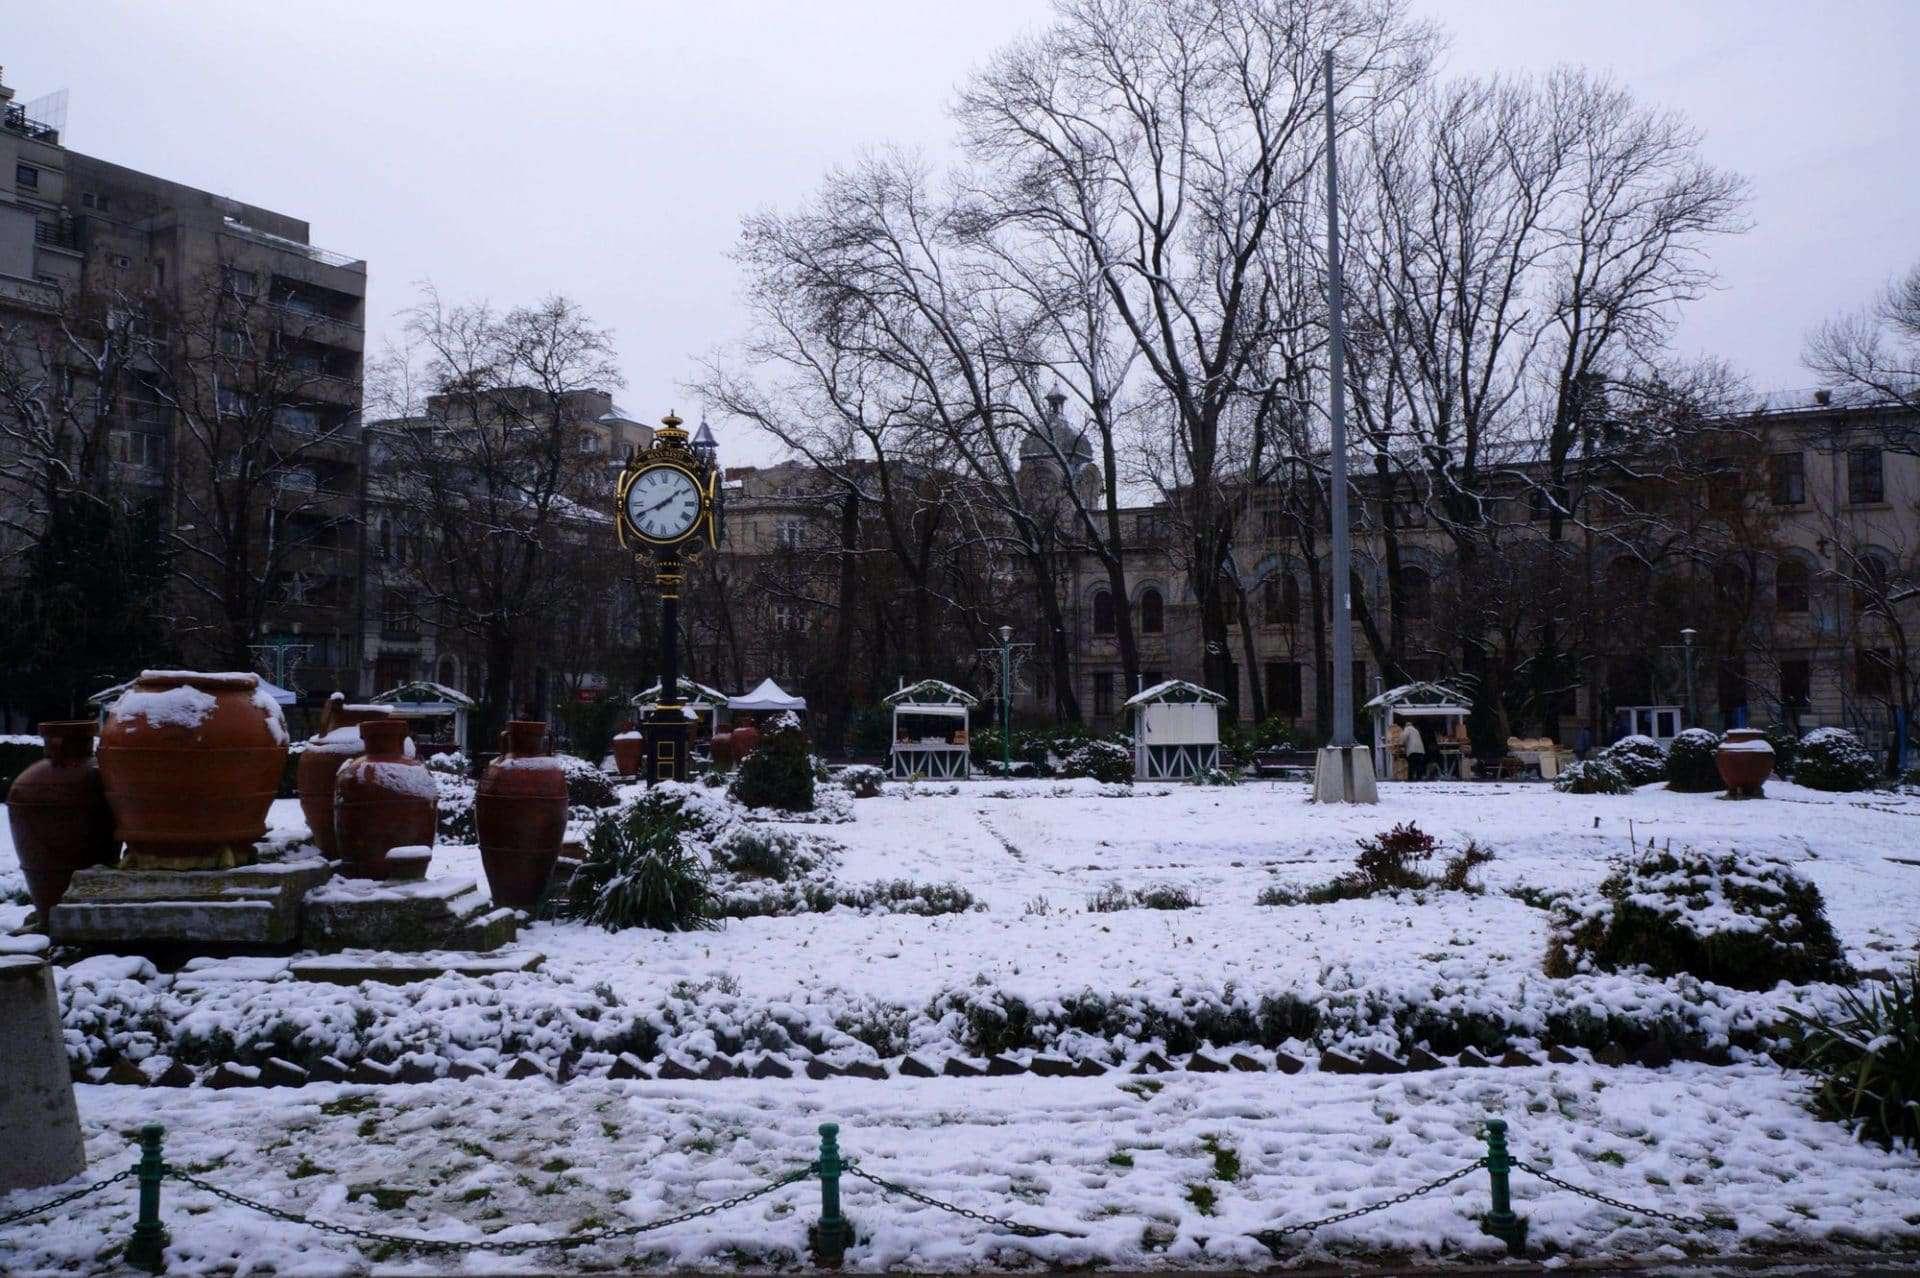 giardini_cismigiu_bucarest_mercatini